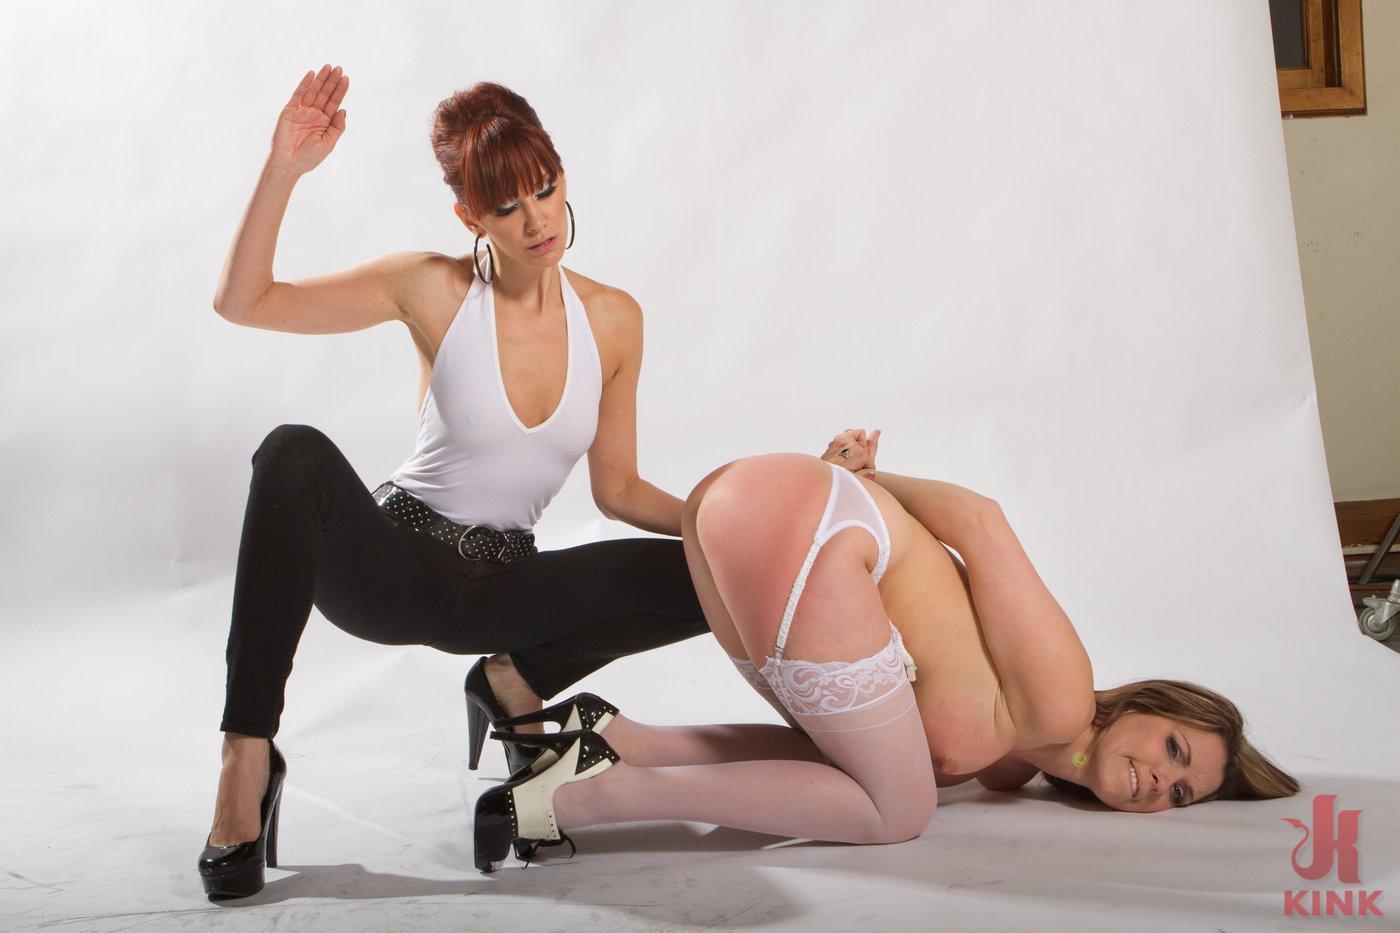 BONUS-Promo-photo-shoot-turned-BDSM-scene-with-Courtney-Cummz